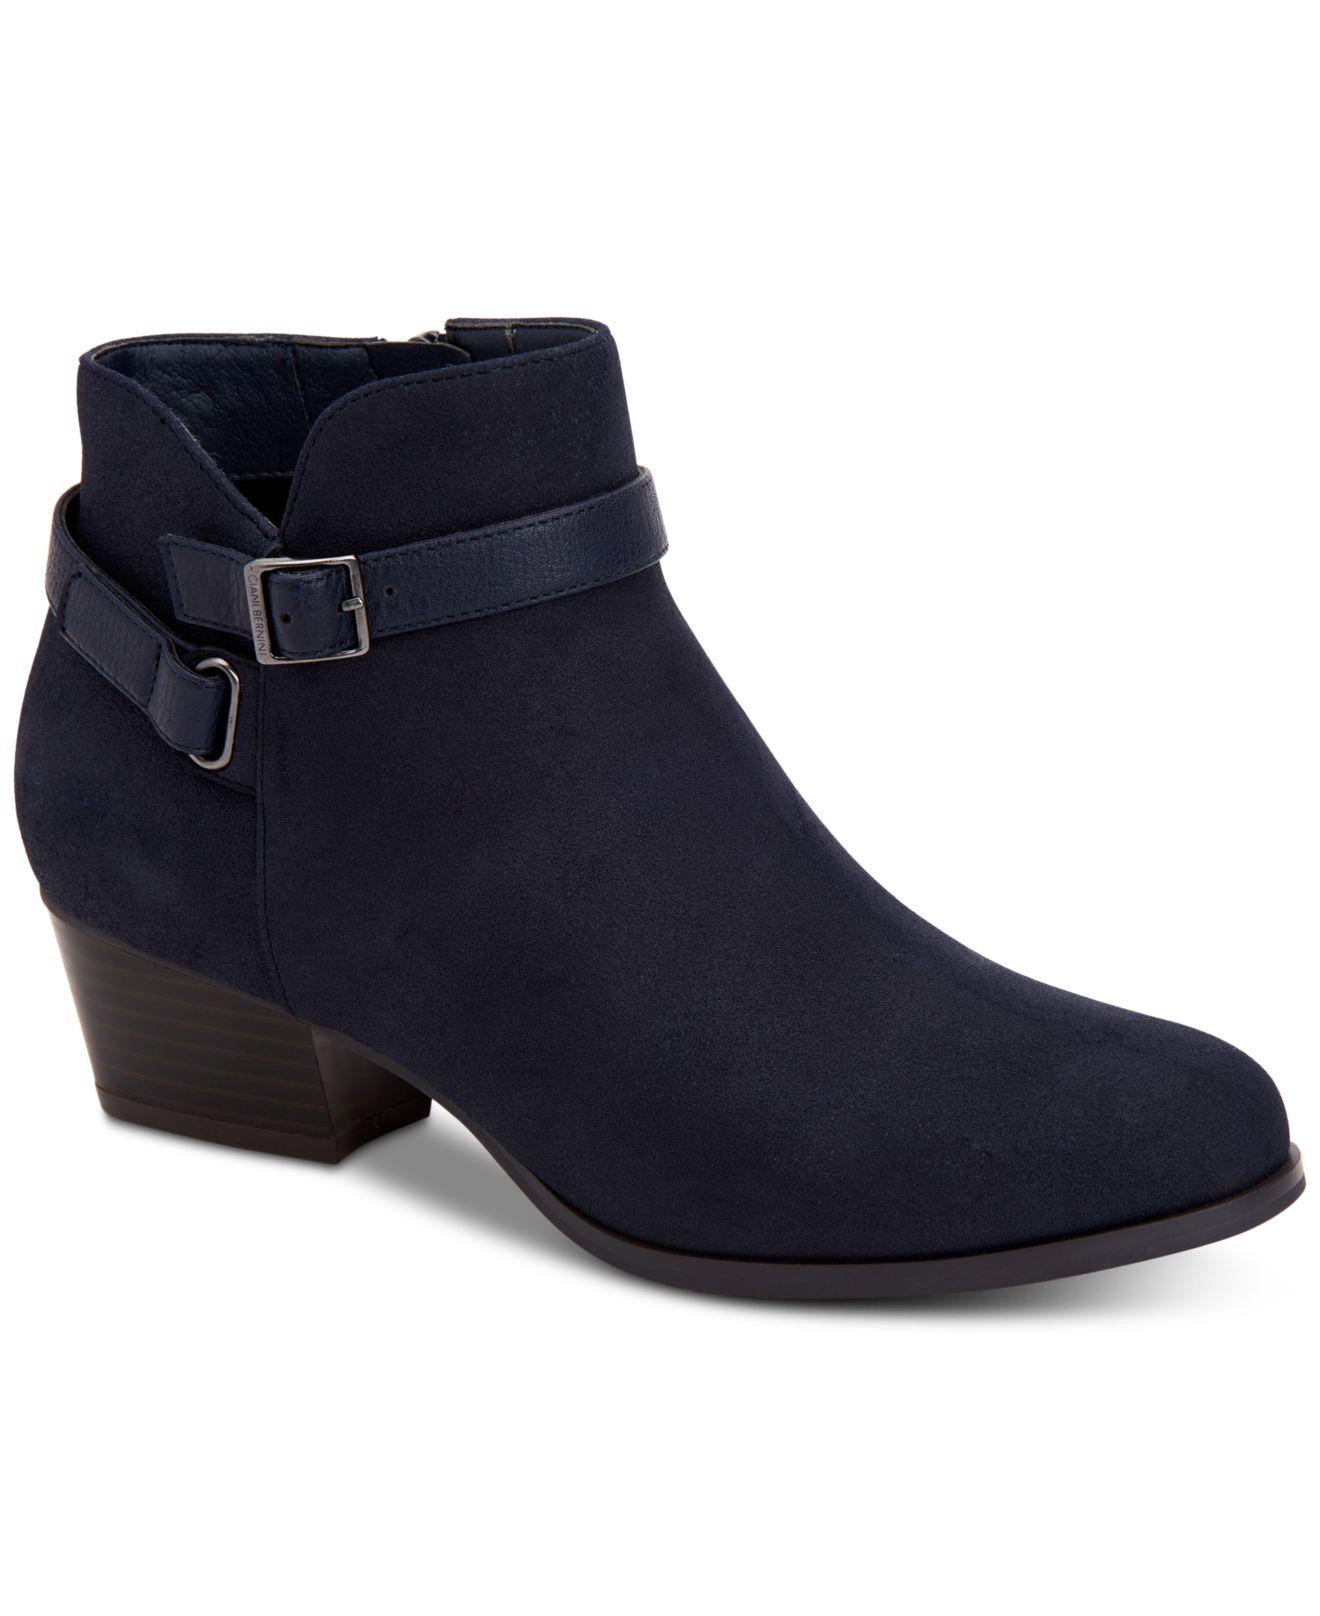 thumbnail 11 - Giani-Bernini-Womens-Dorii-Leather-Almond-Toe-Ankle-Fashion-Boots